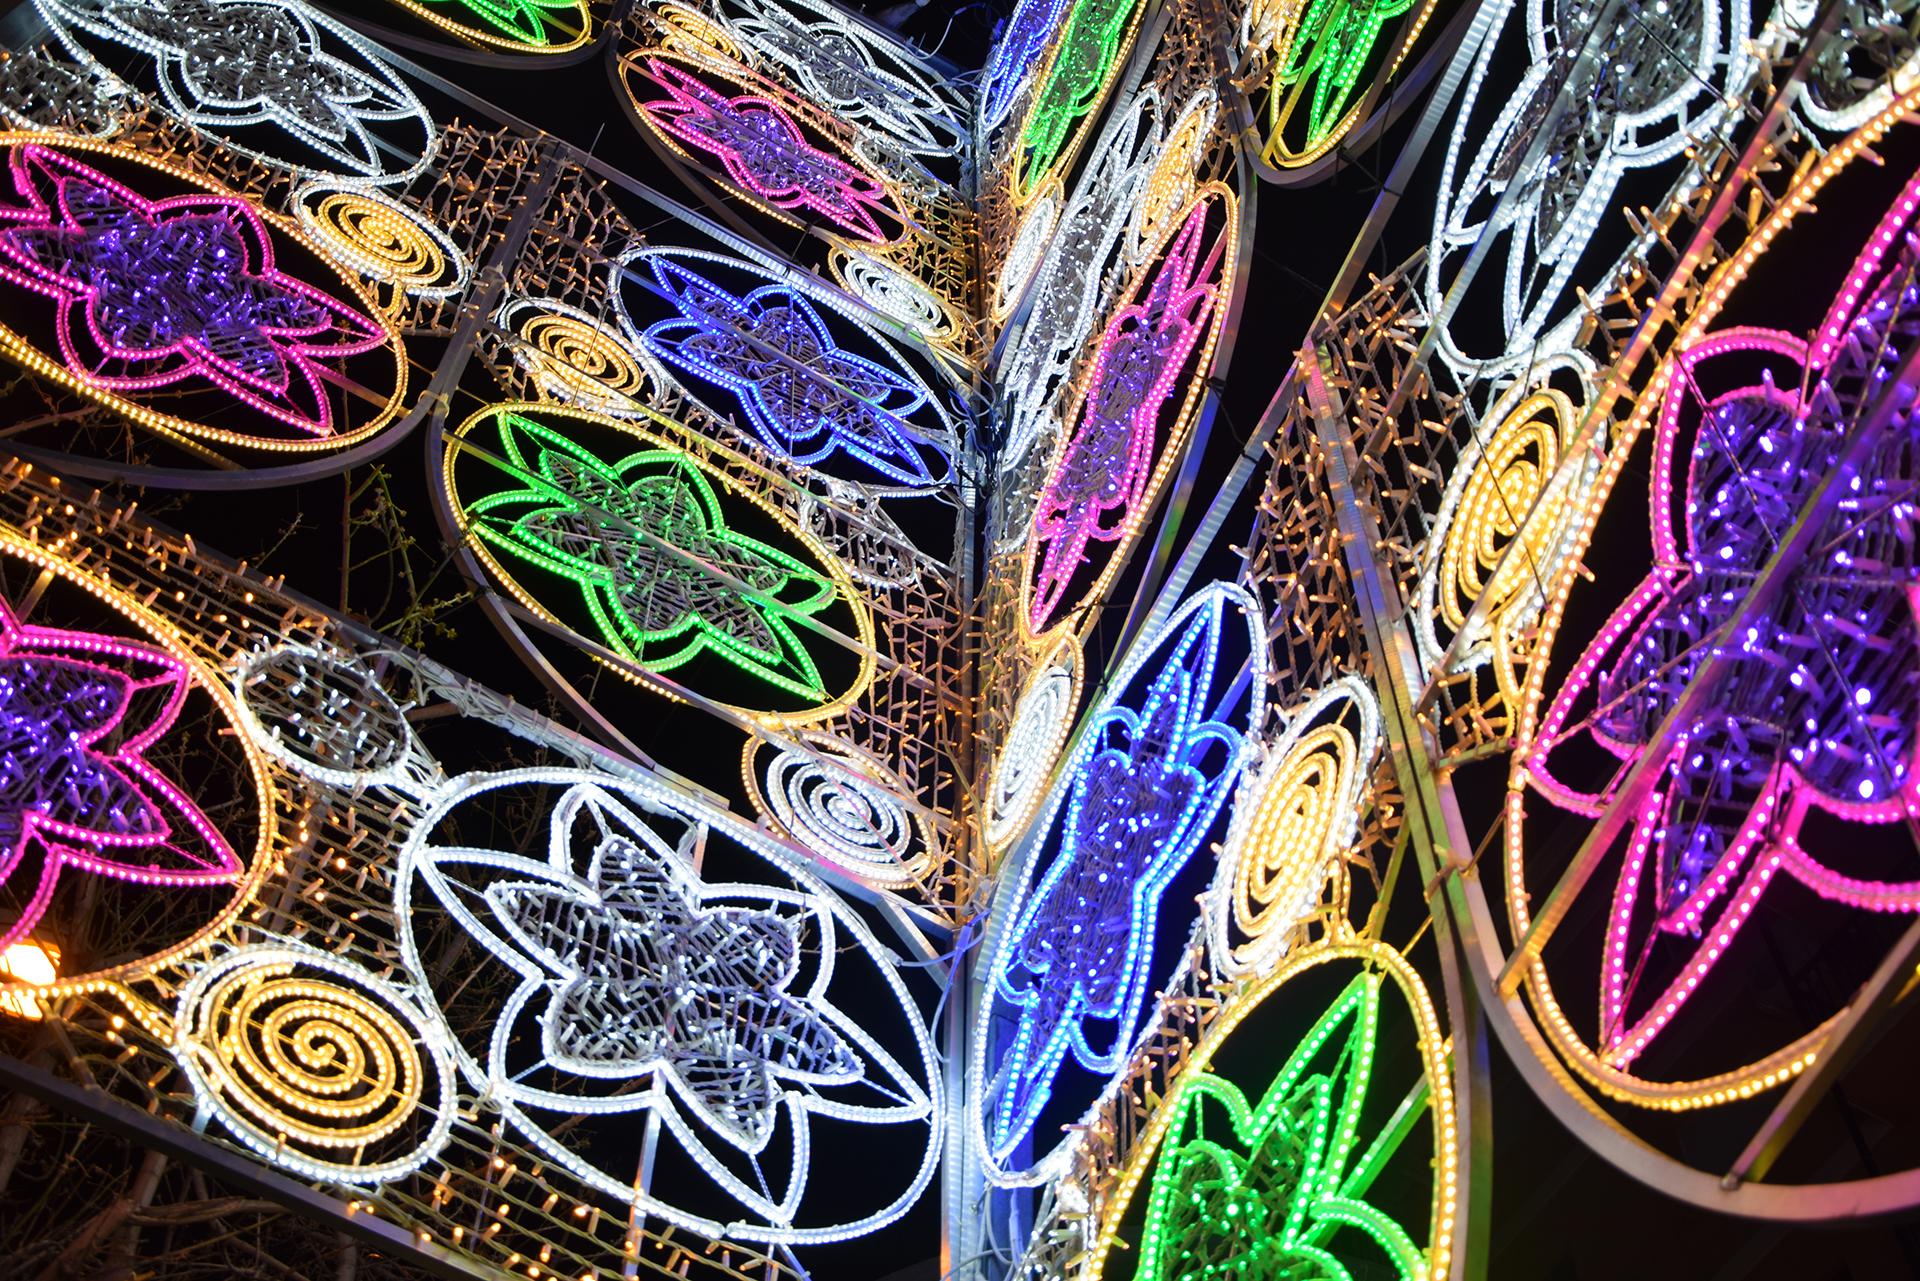 3 Elecfes Iluminaciones Fiesta